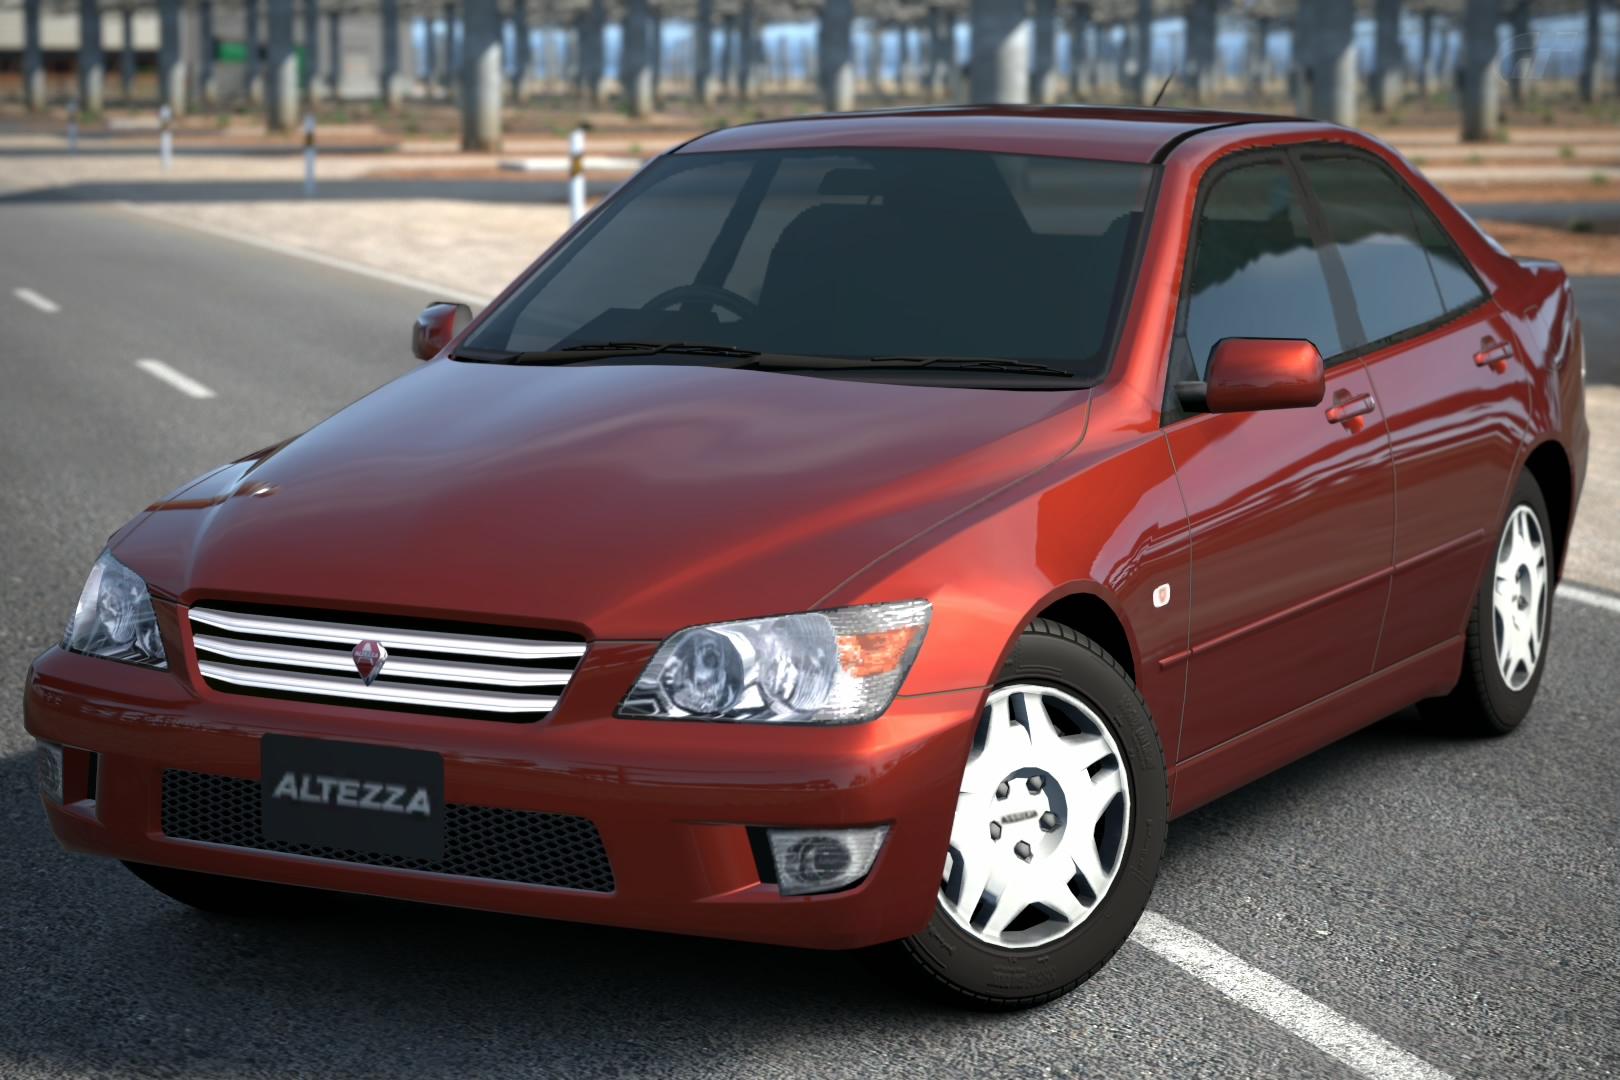 Kelebihan Kekurangan Toyota Altezza Harga